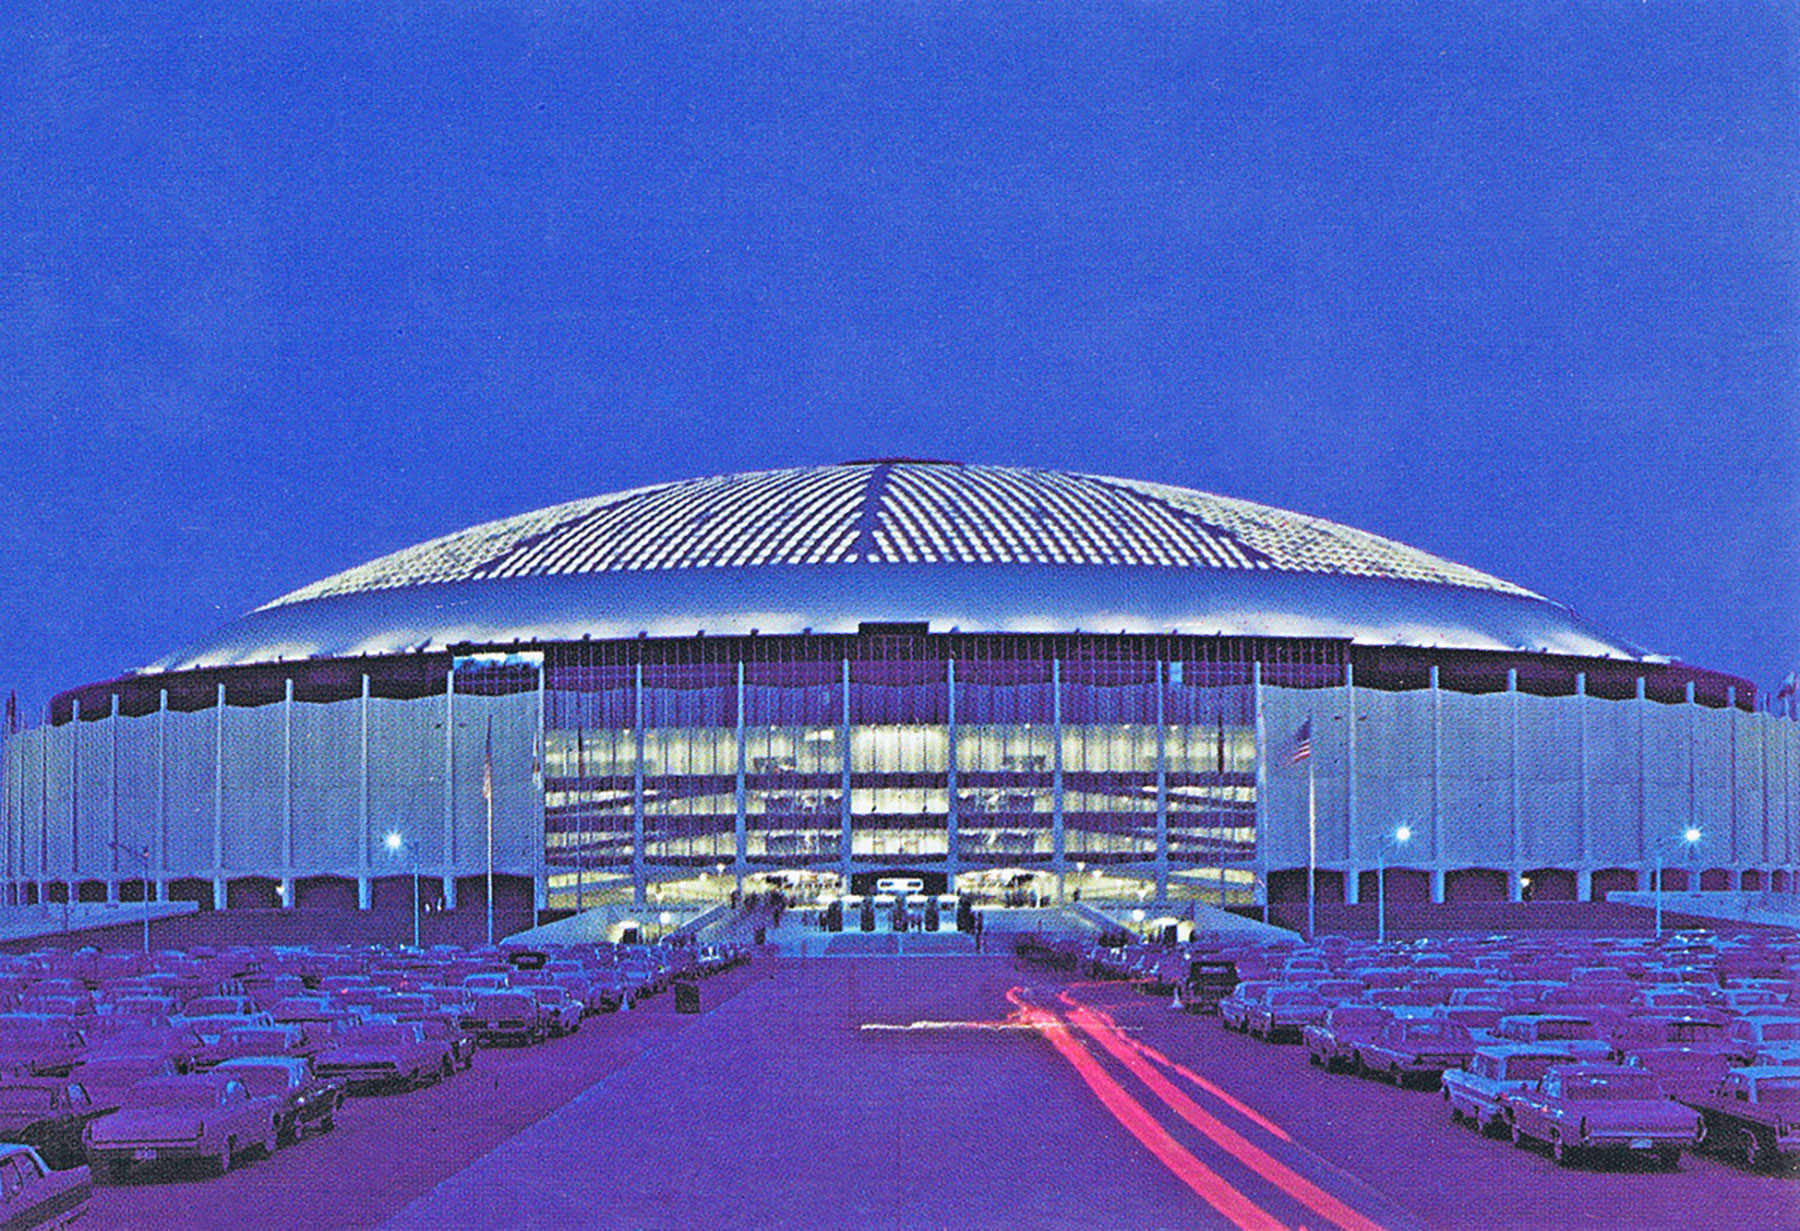 Harris County Domed Stadium (1965, Wilson, Morris, Crain & Anderson with Lloyd, Morgan & Jones) /  postcard from PH file